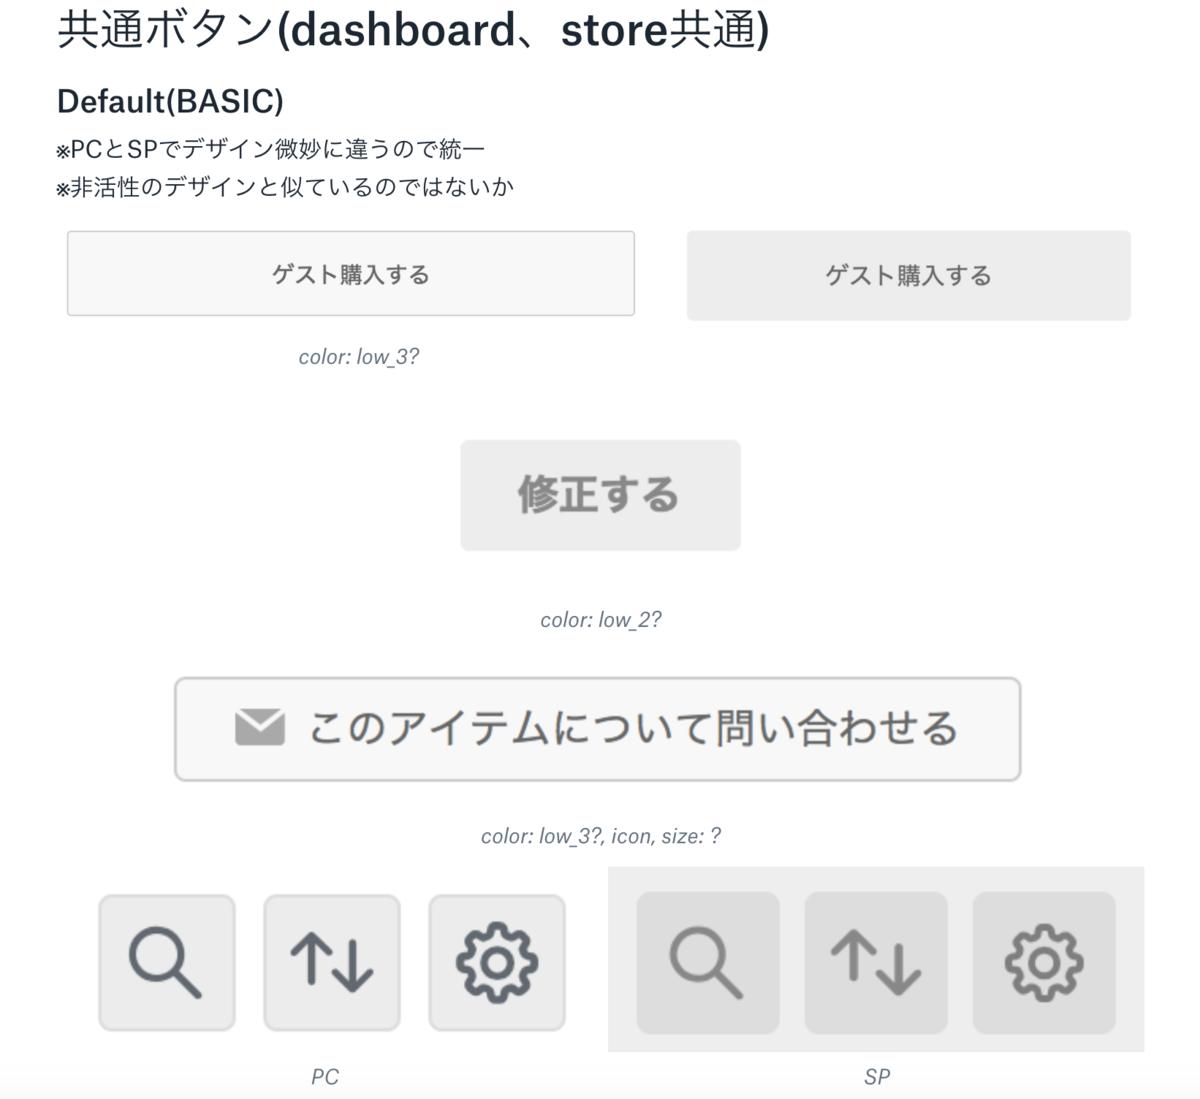 f:id:daitasu:20200730192523p:plain